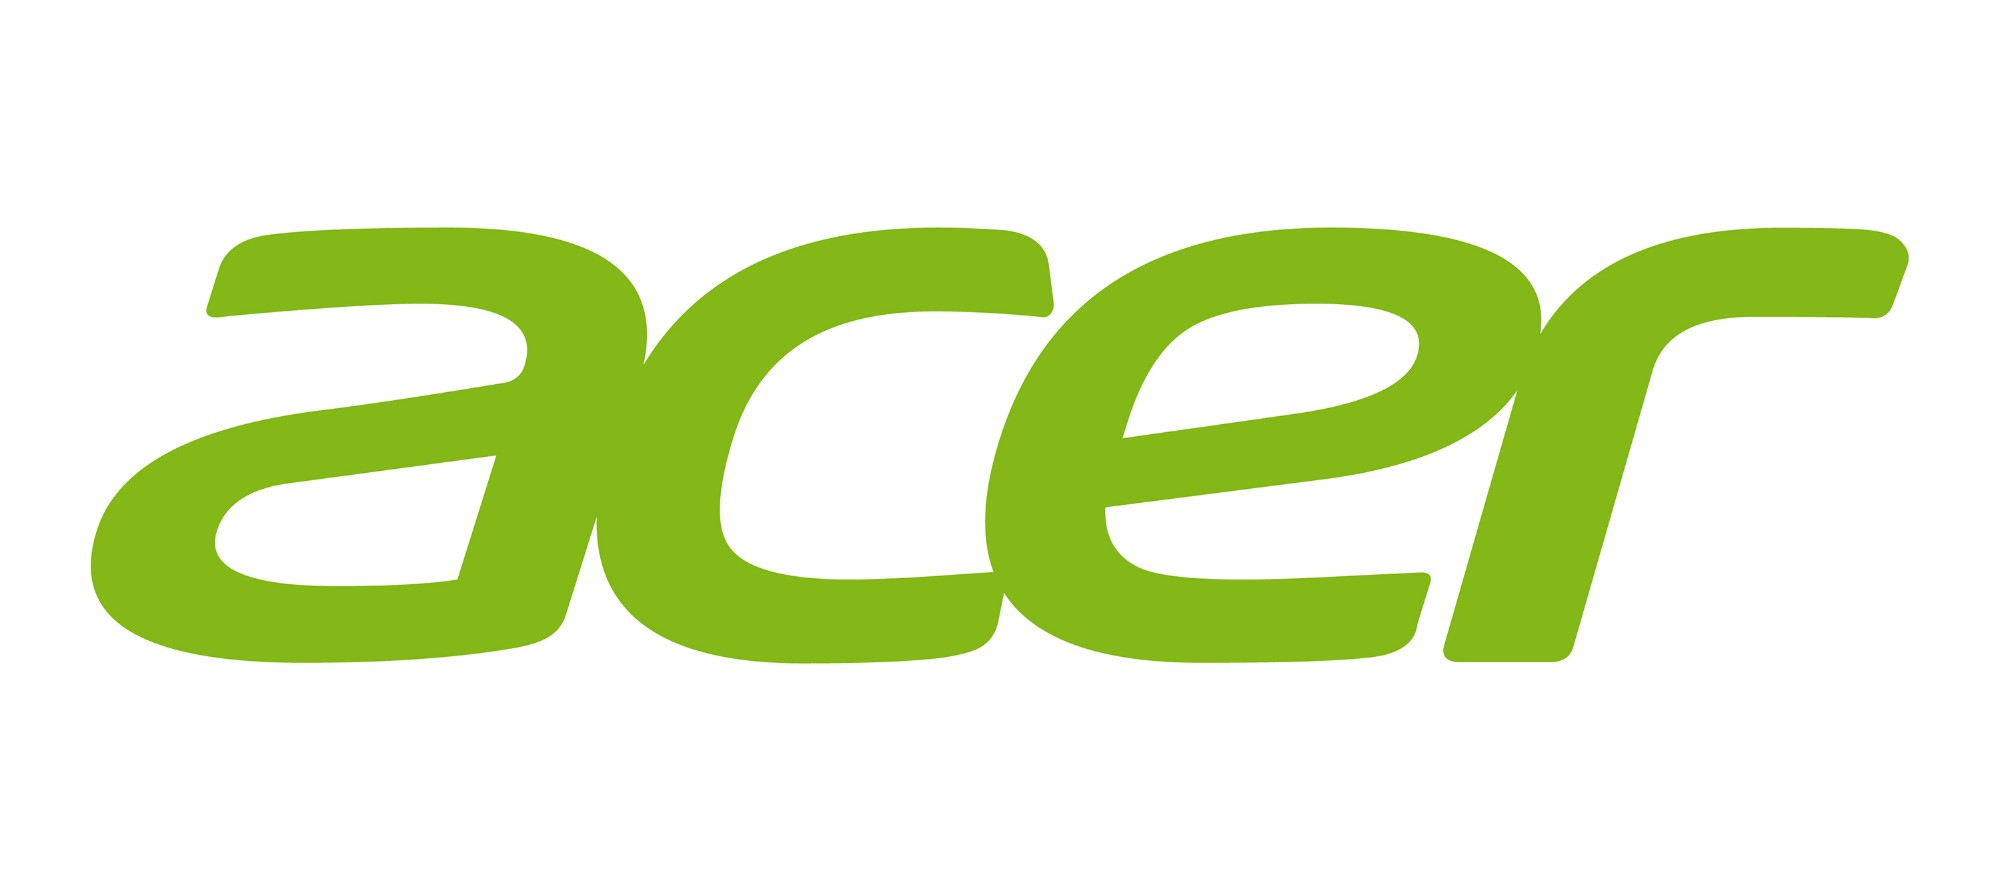 Acer Chromebook C733U-C2XV